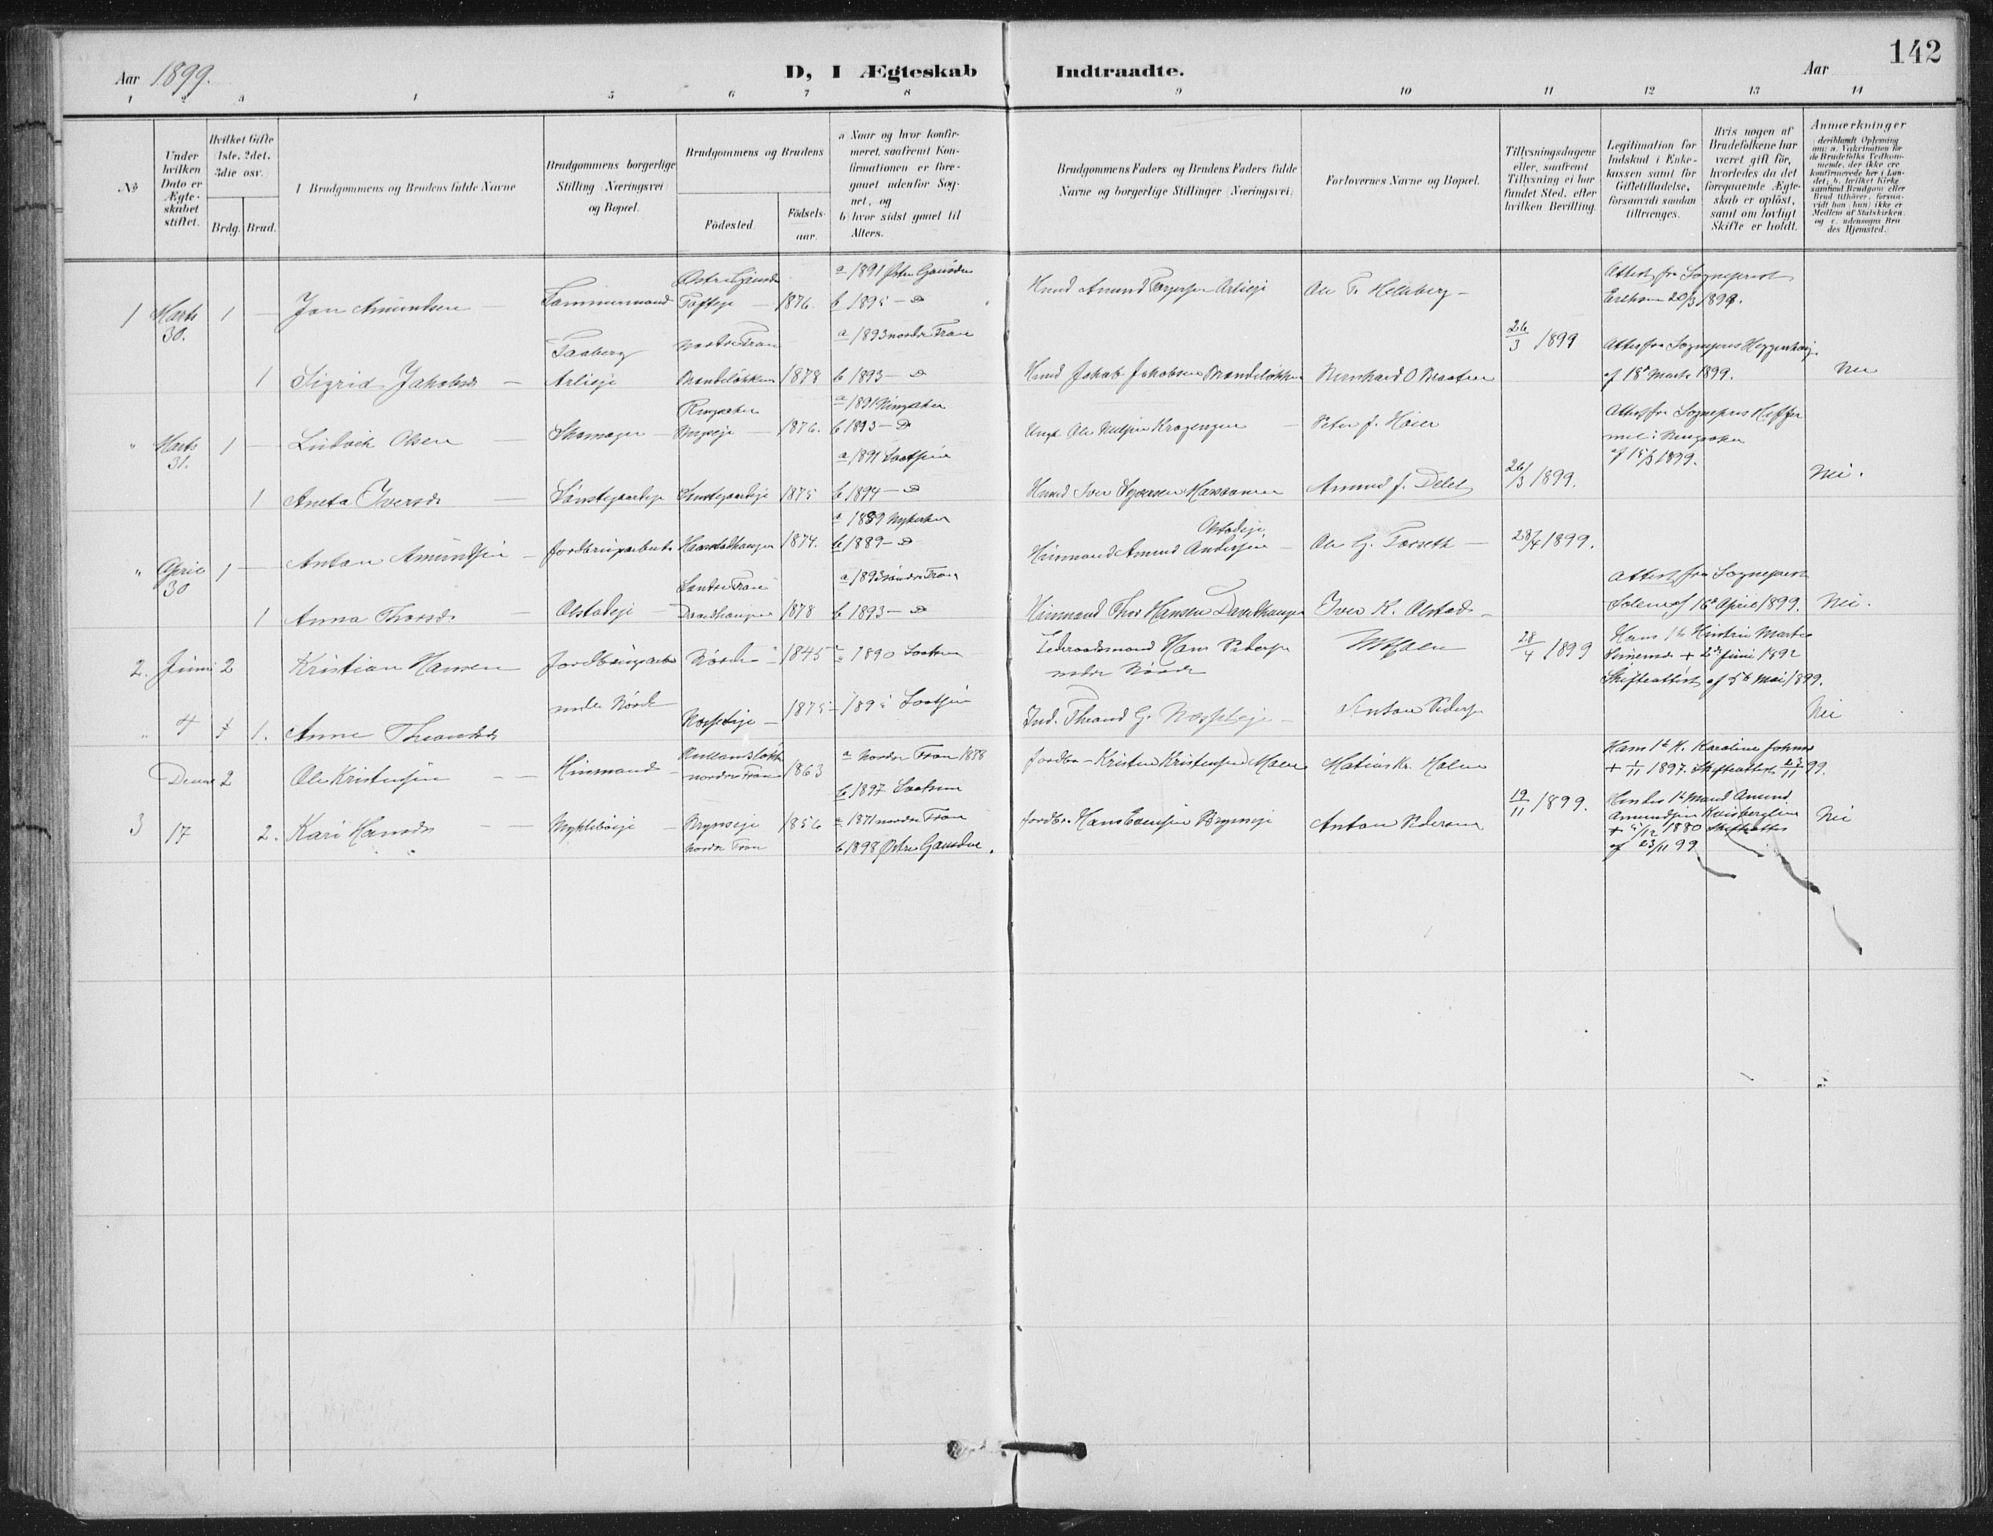 SAH, Vestre Gausdal prestekontor, Klokkerbok nr. 4, 1898-1939, s. 142